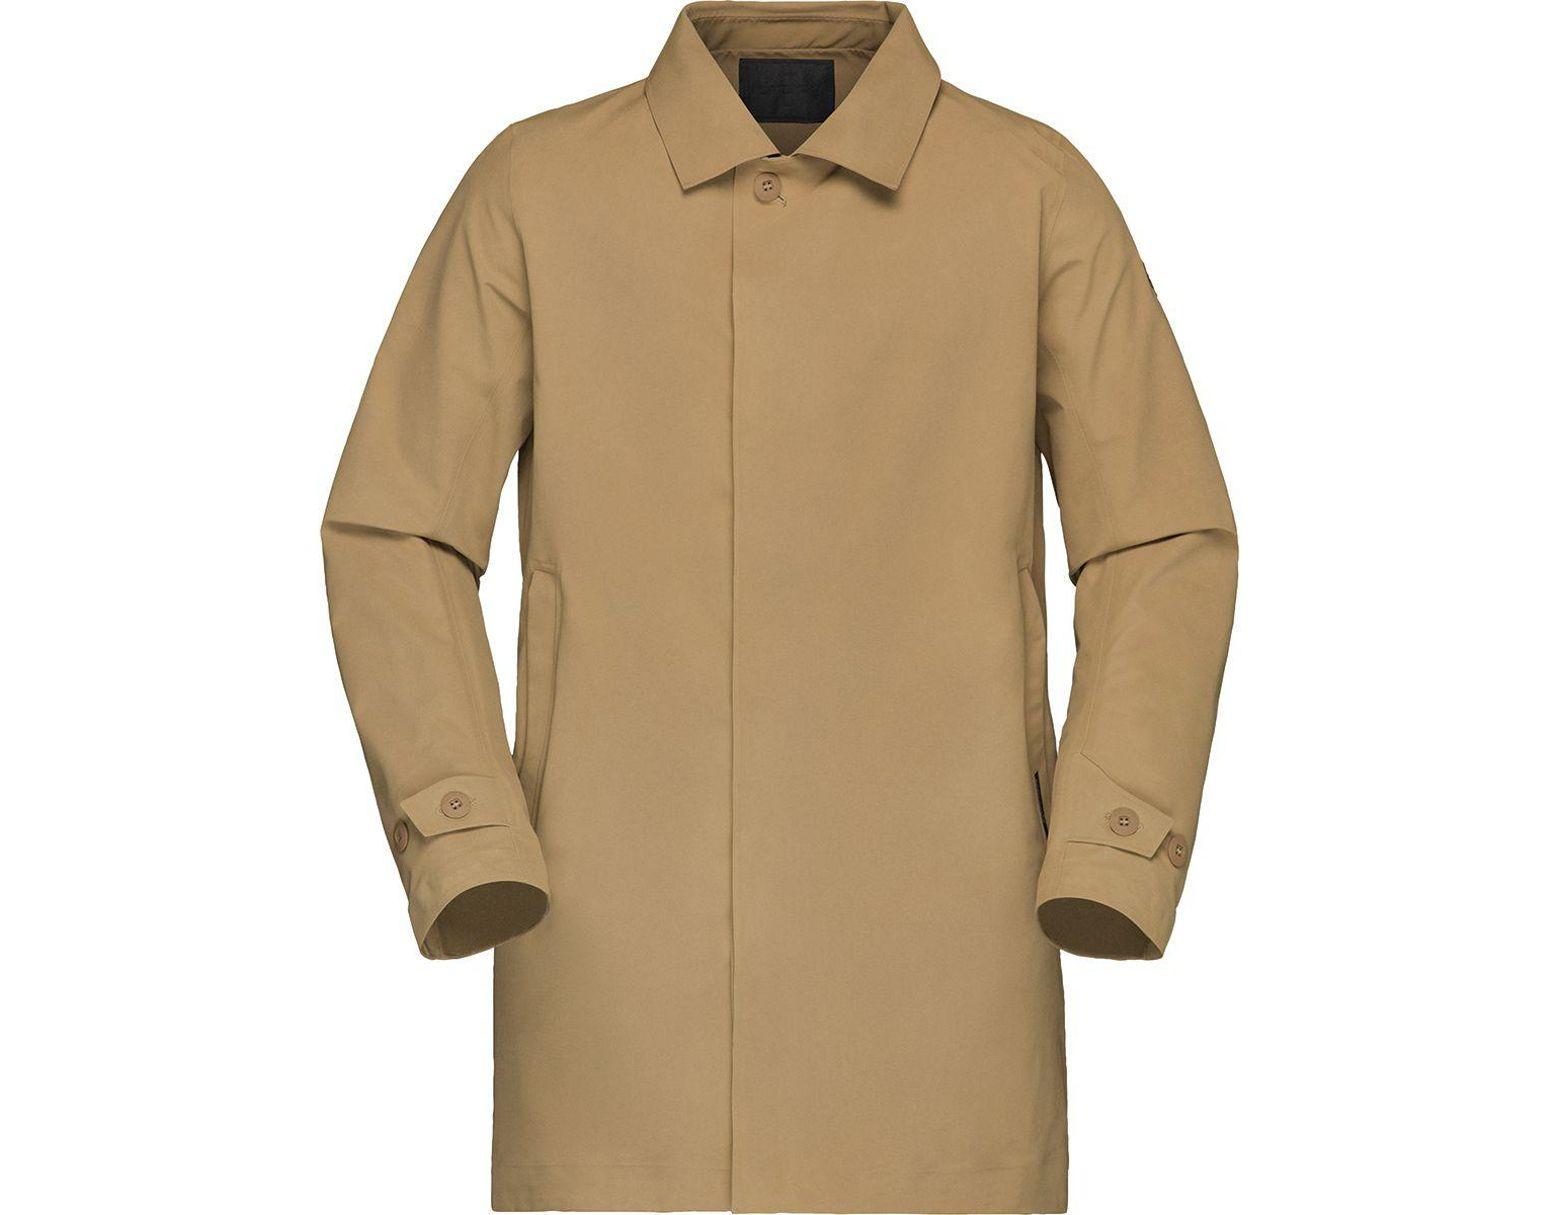 9a3955223f8 Norrøna Oslo Gore-tex Coat in Brown for Men - Lyst